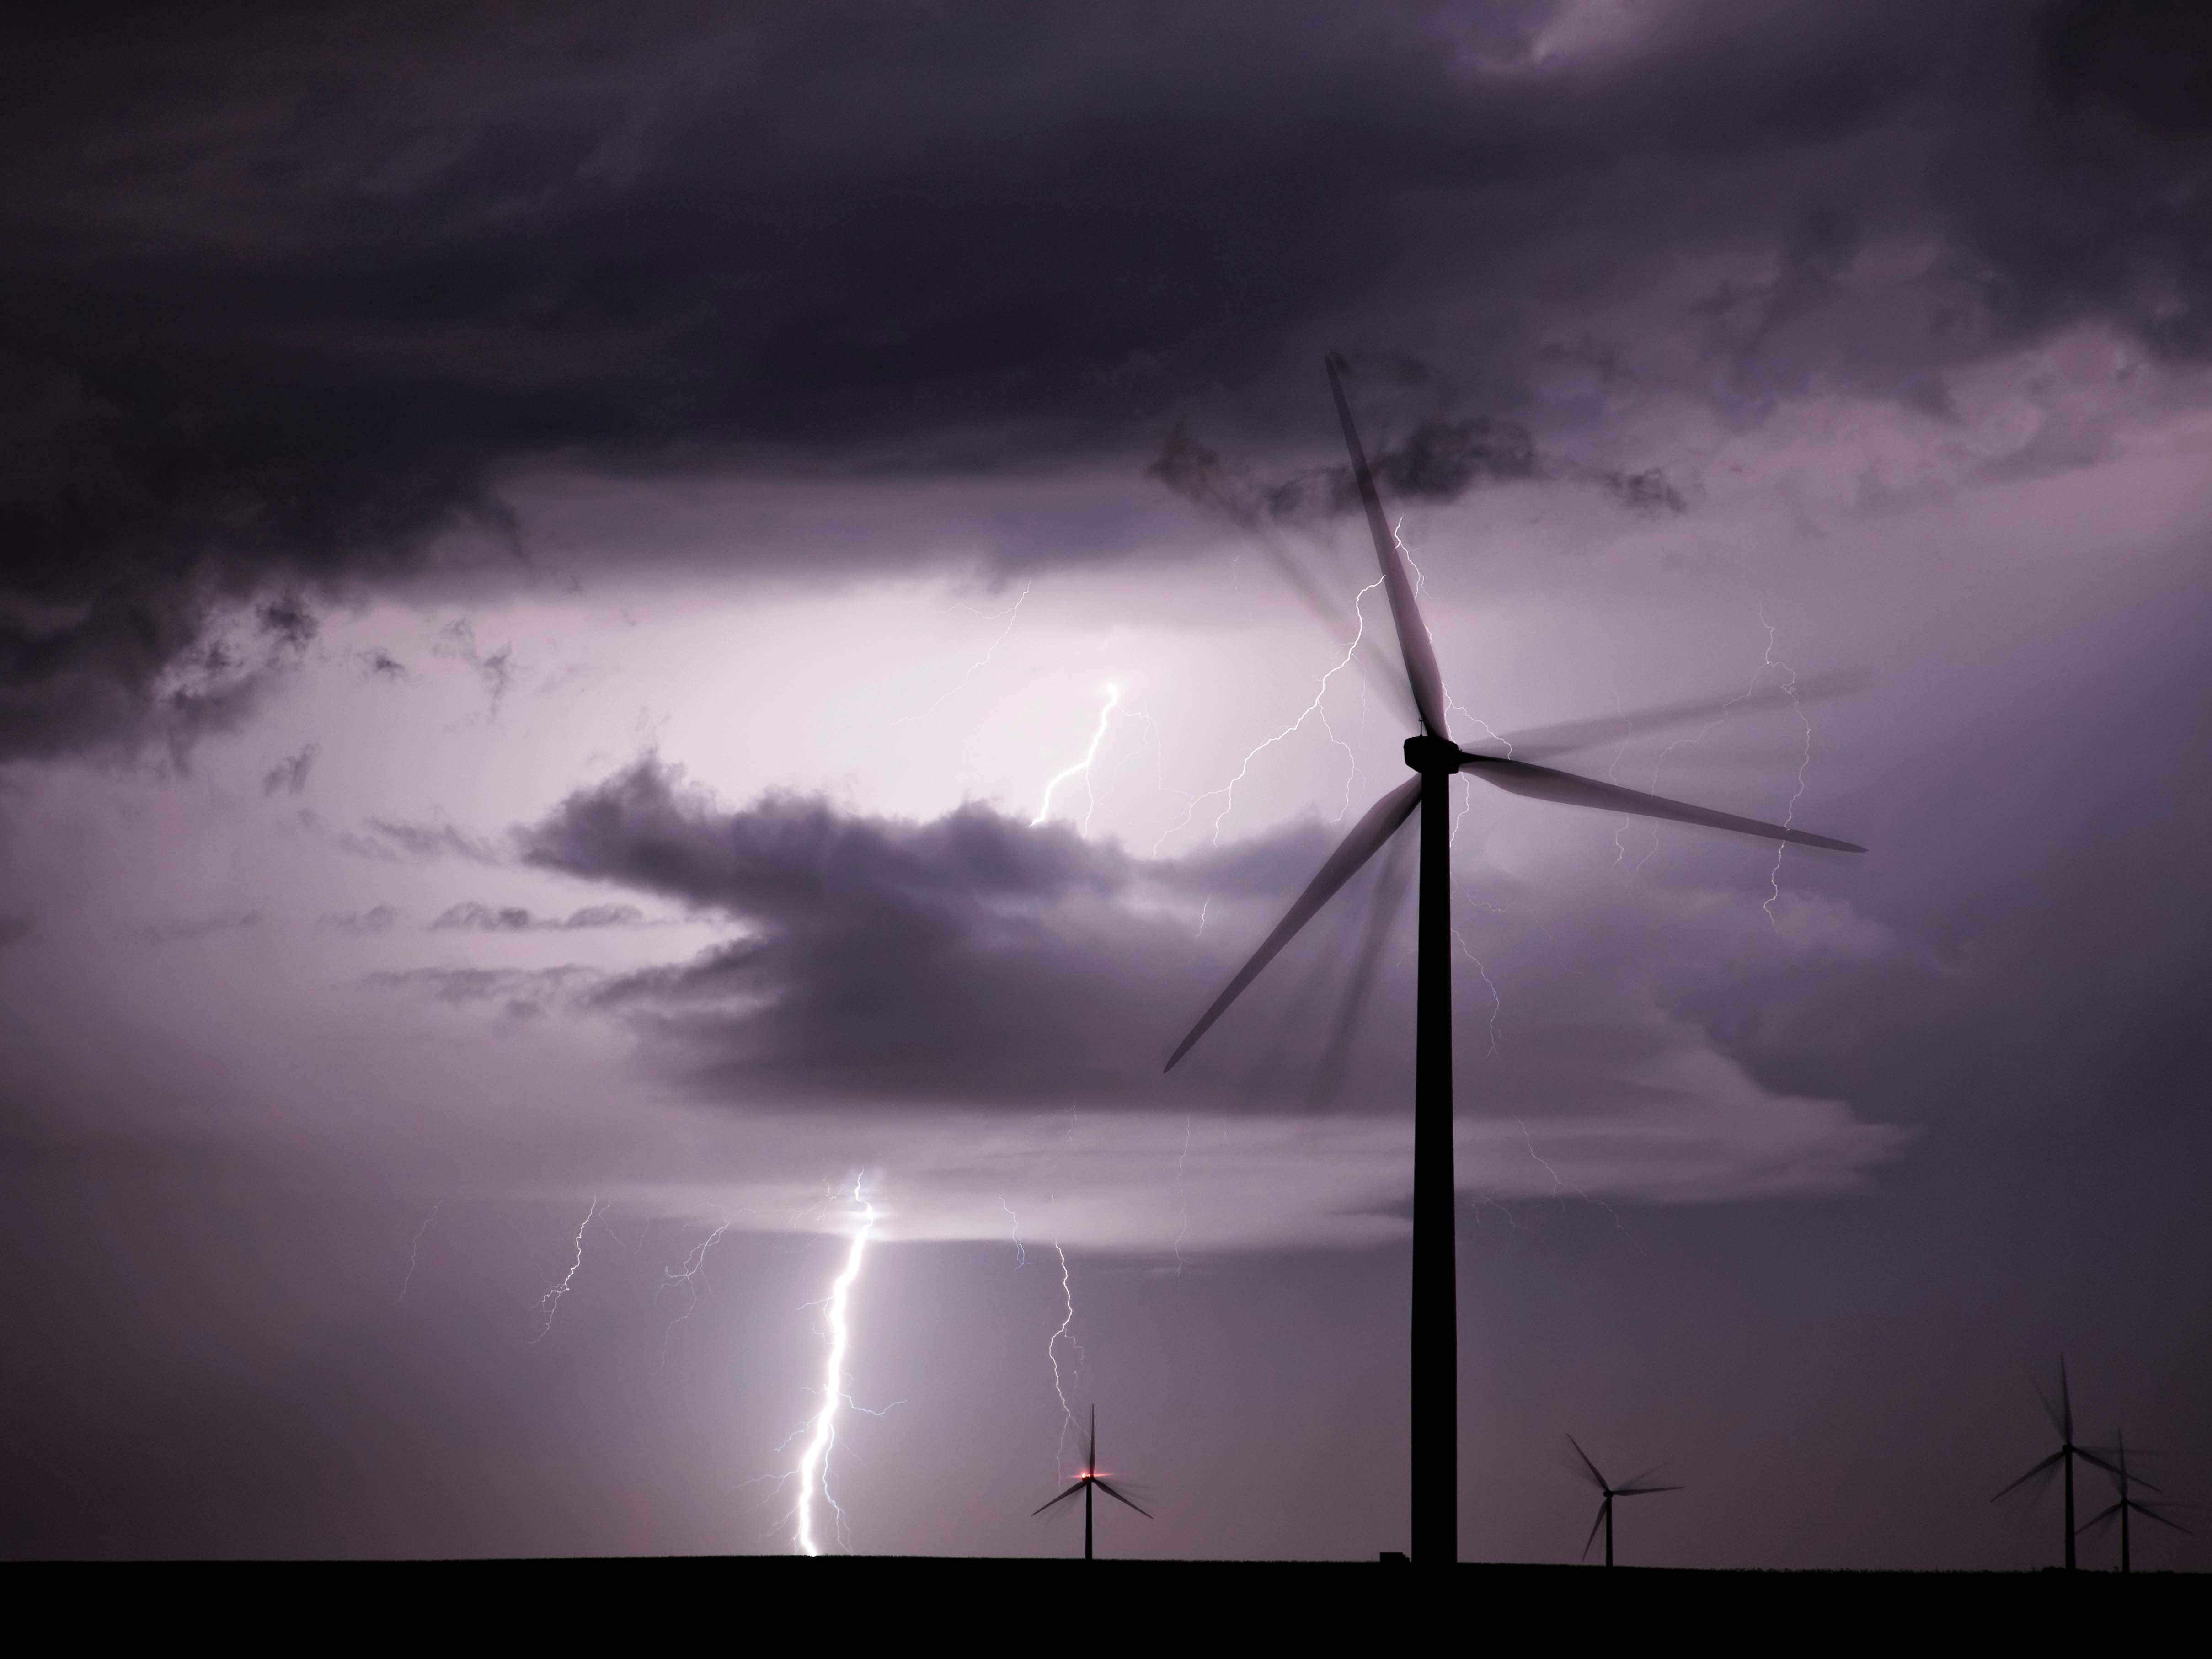 wind turbine being struck by lightning